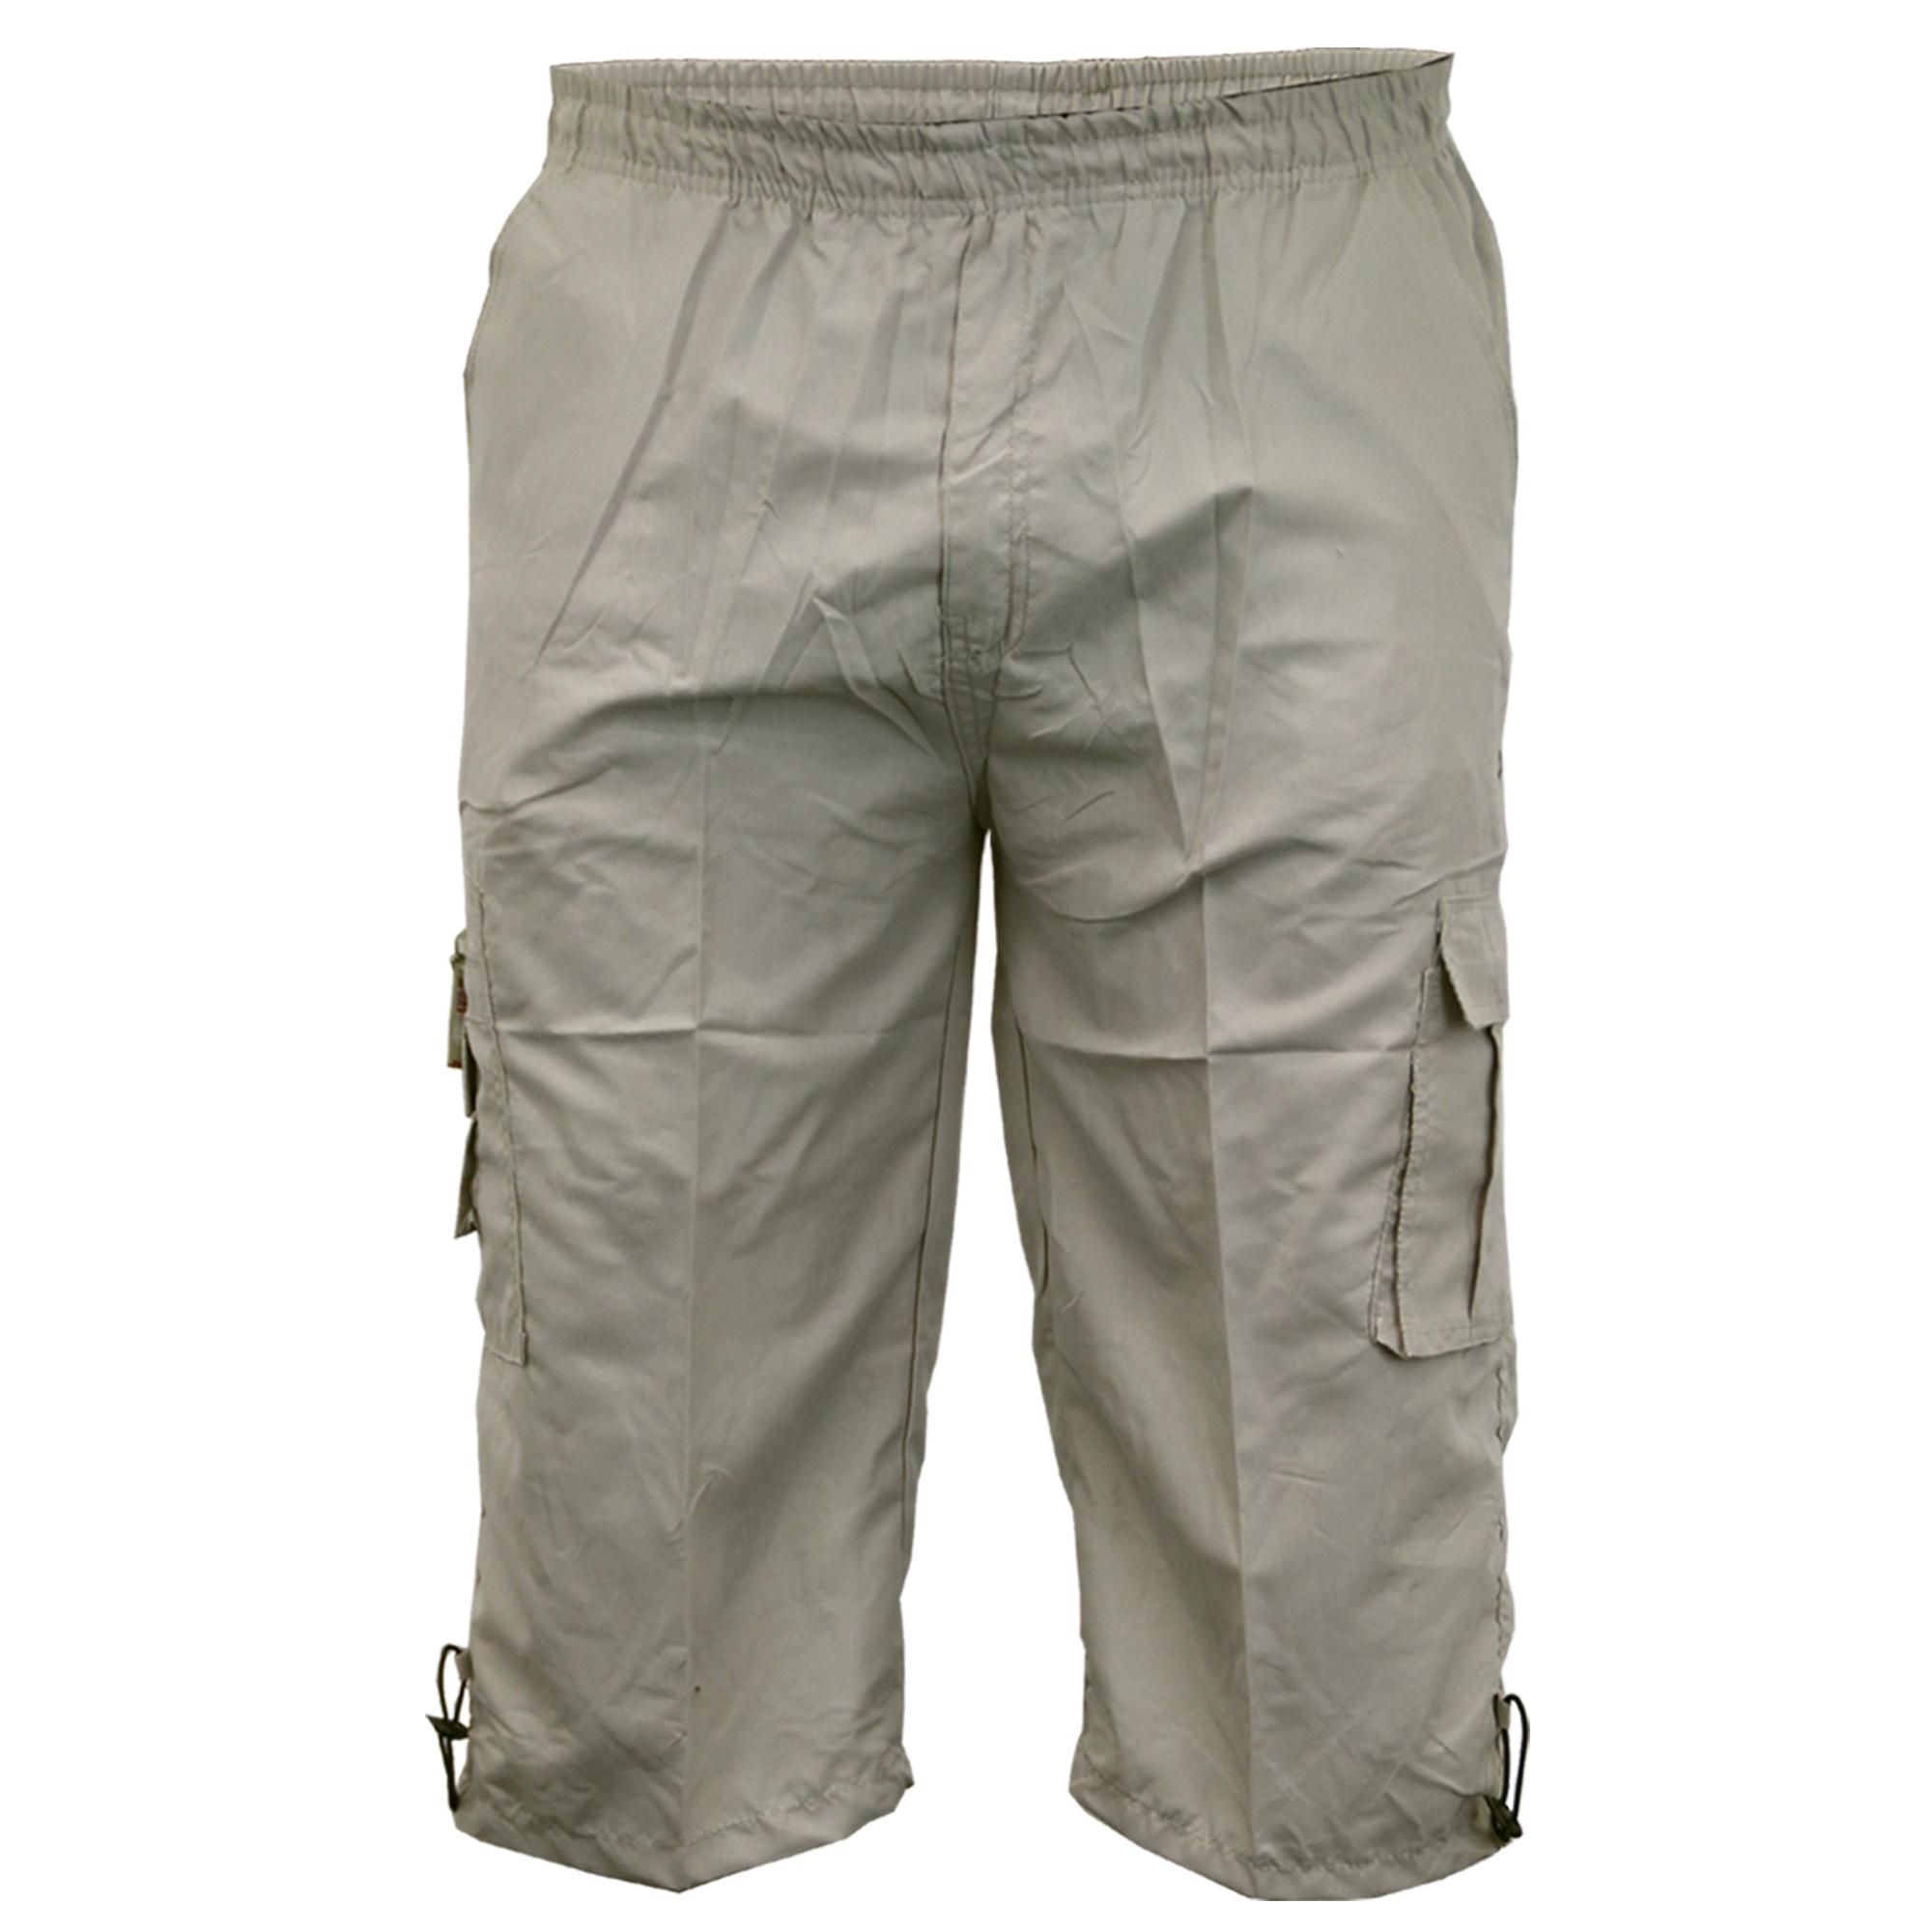 Mens-Combat-Cargo-Shorts-3-4-Length-Plain-Sport-Fashion-Casual-Summer-New thumbnail 18